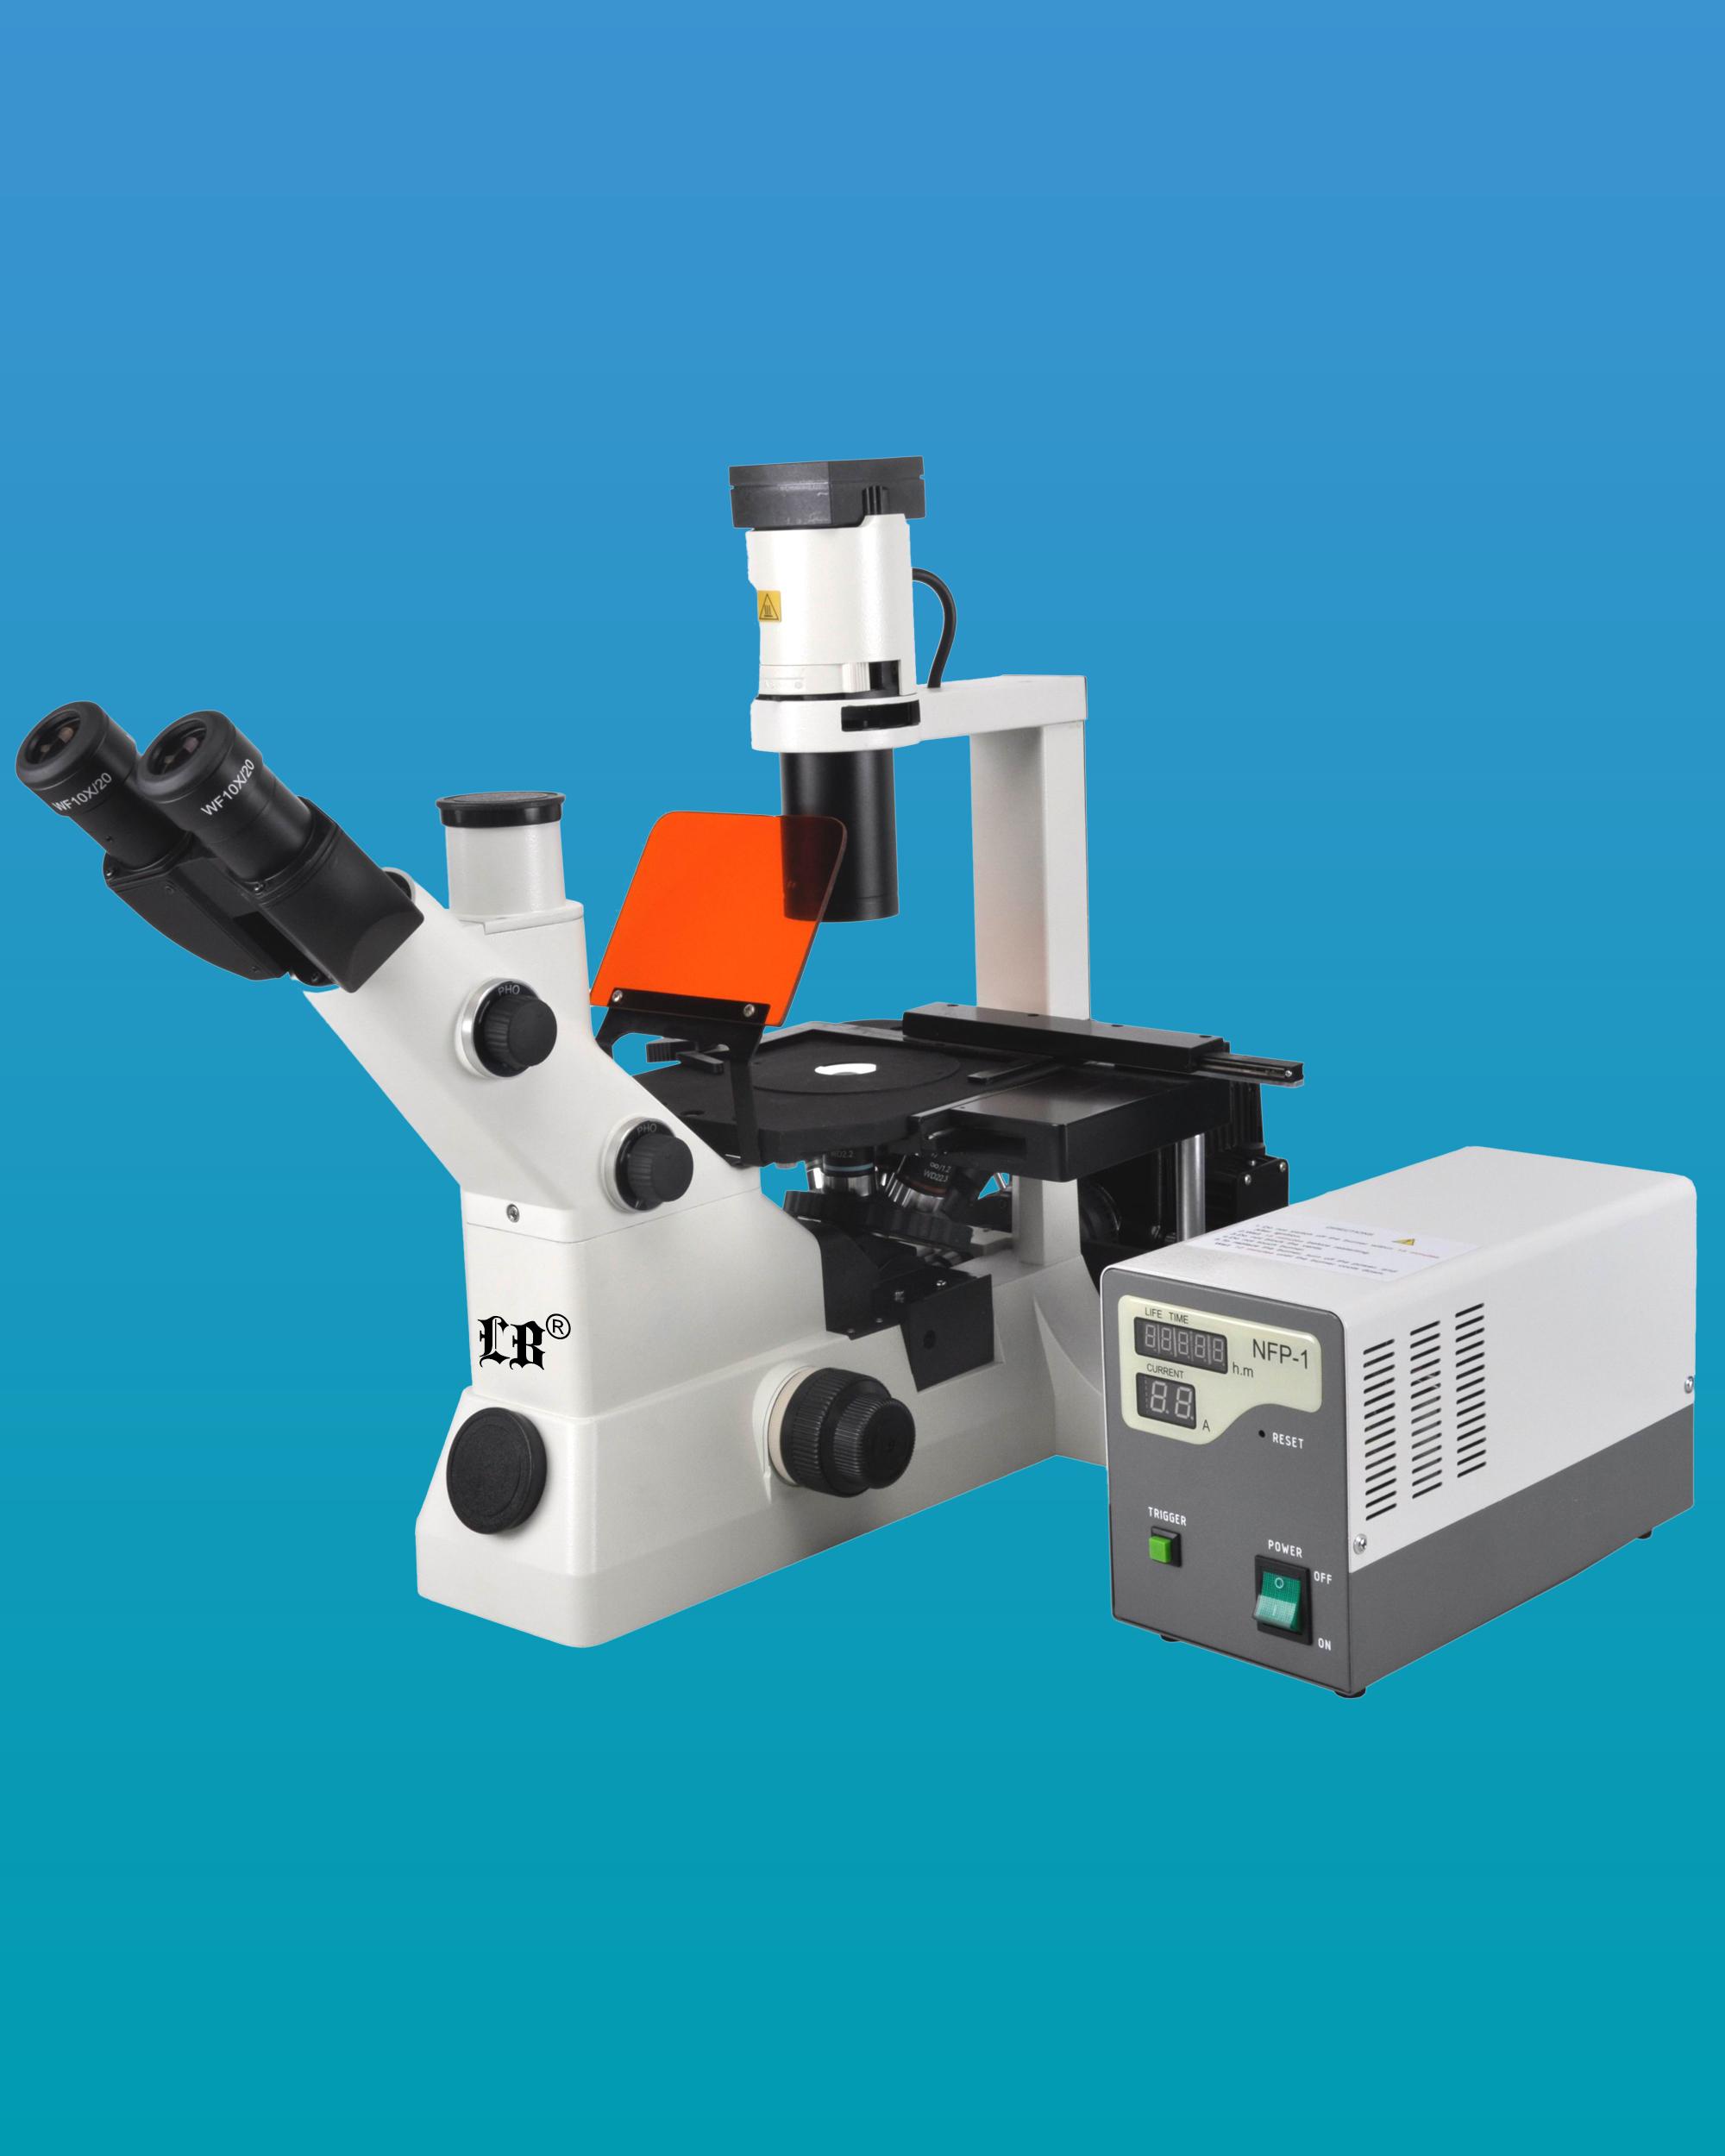 [LB-705] Trinocular Inverted Flourescent Biological Microscope w/ Wide Field & Infinite Optical System